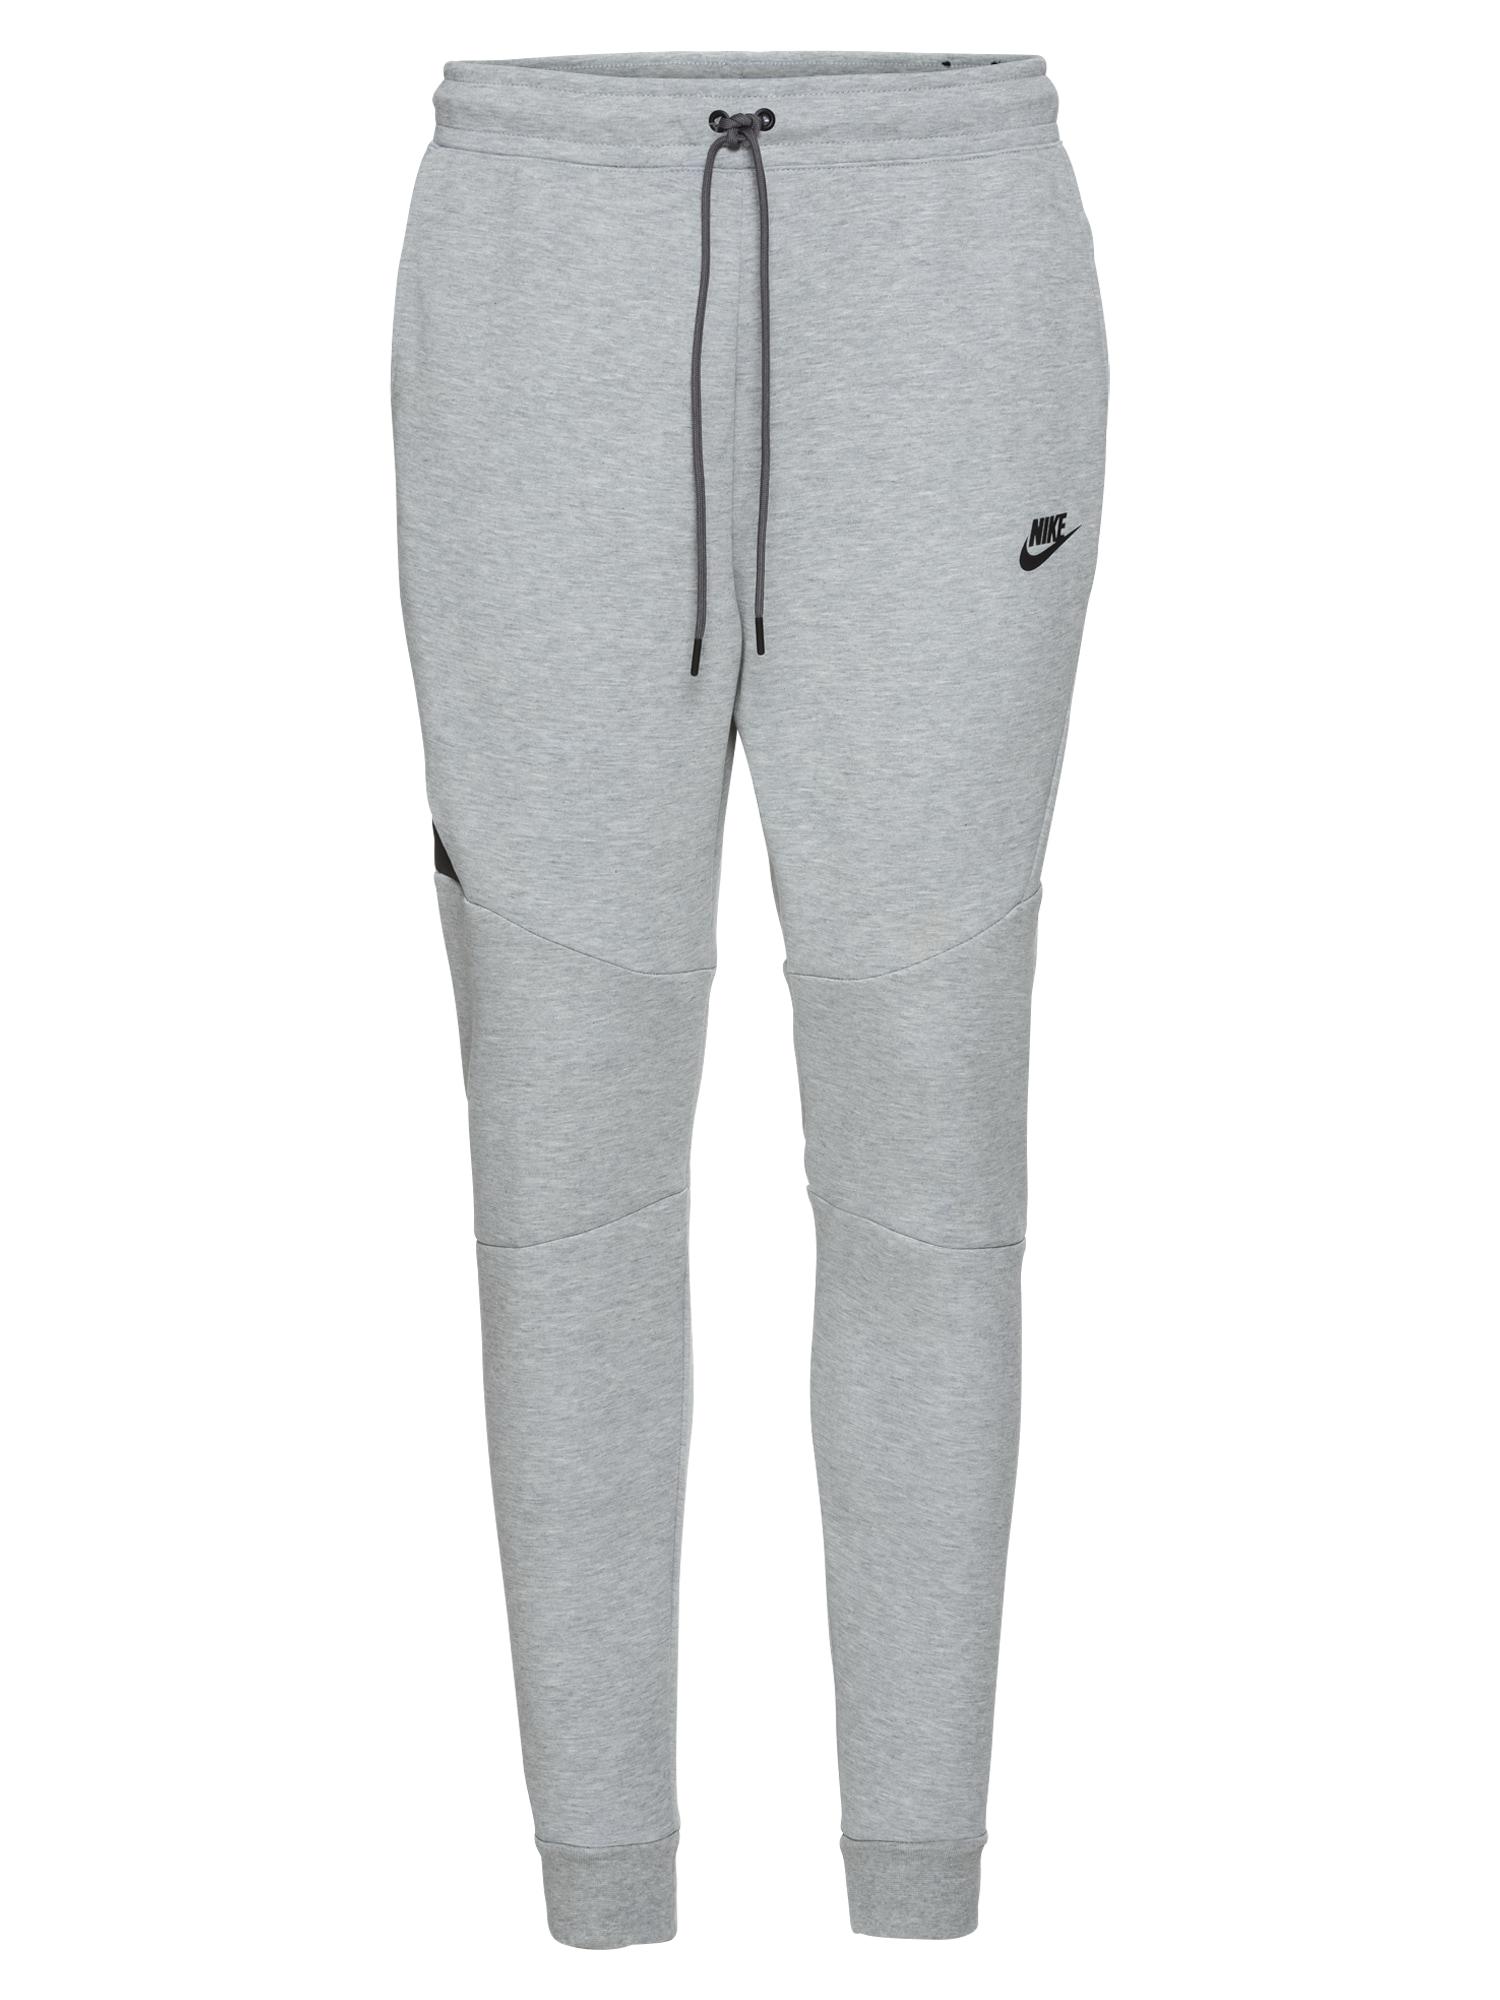 Nike Sportswear Kelnės margai pilka